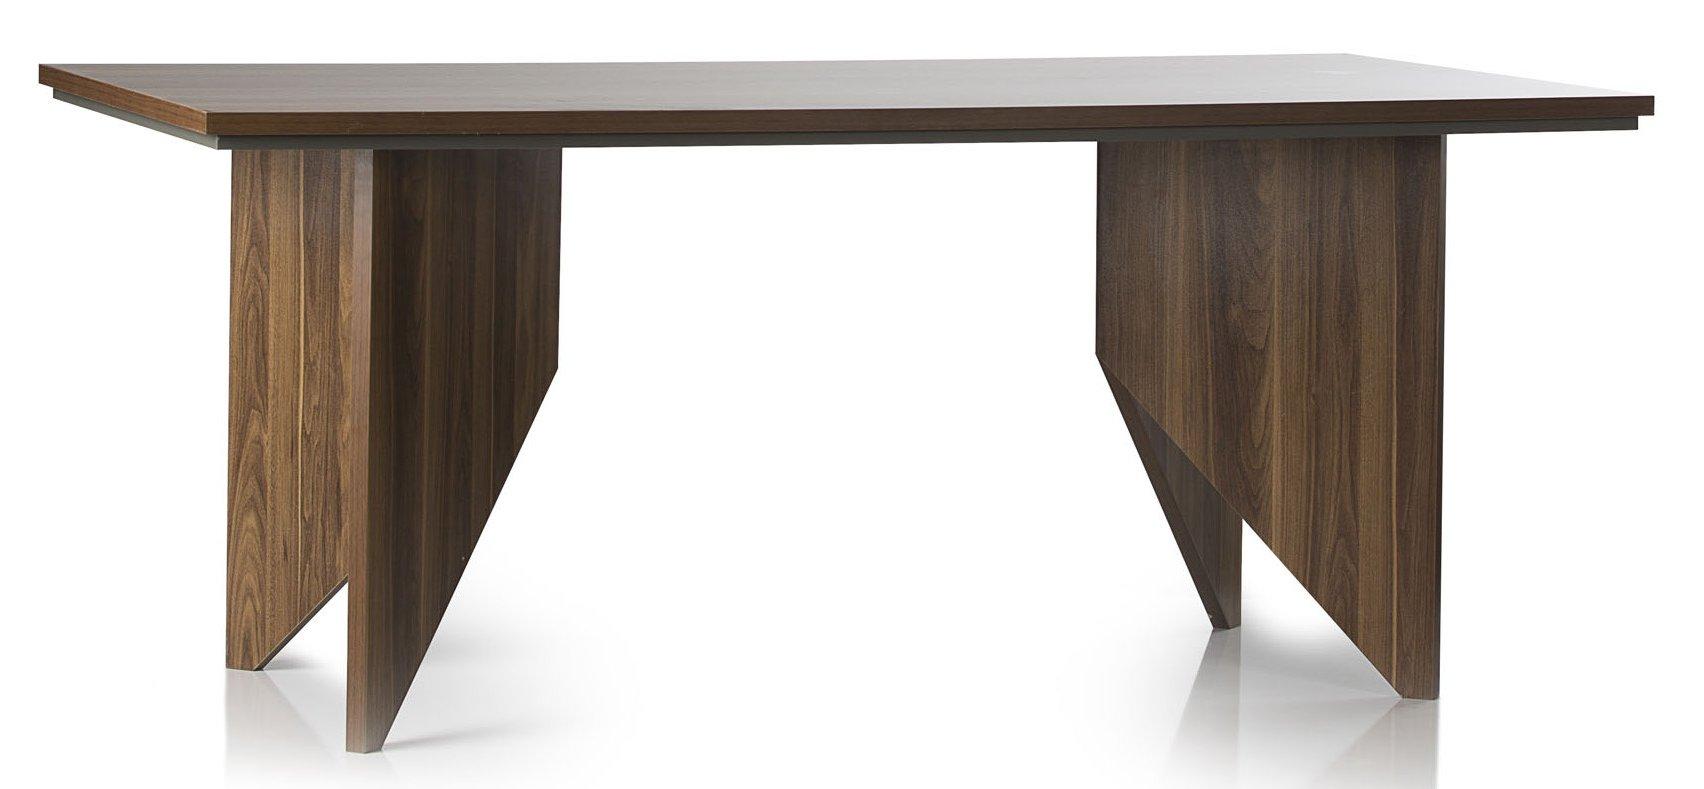 UK CF U 180DINING WGR Dining Room Tables